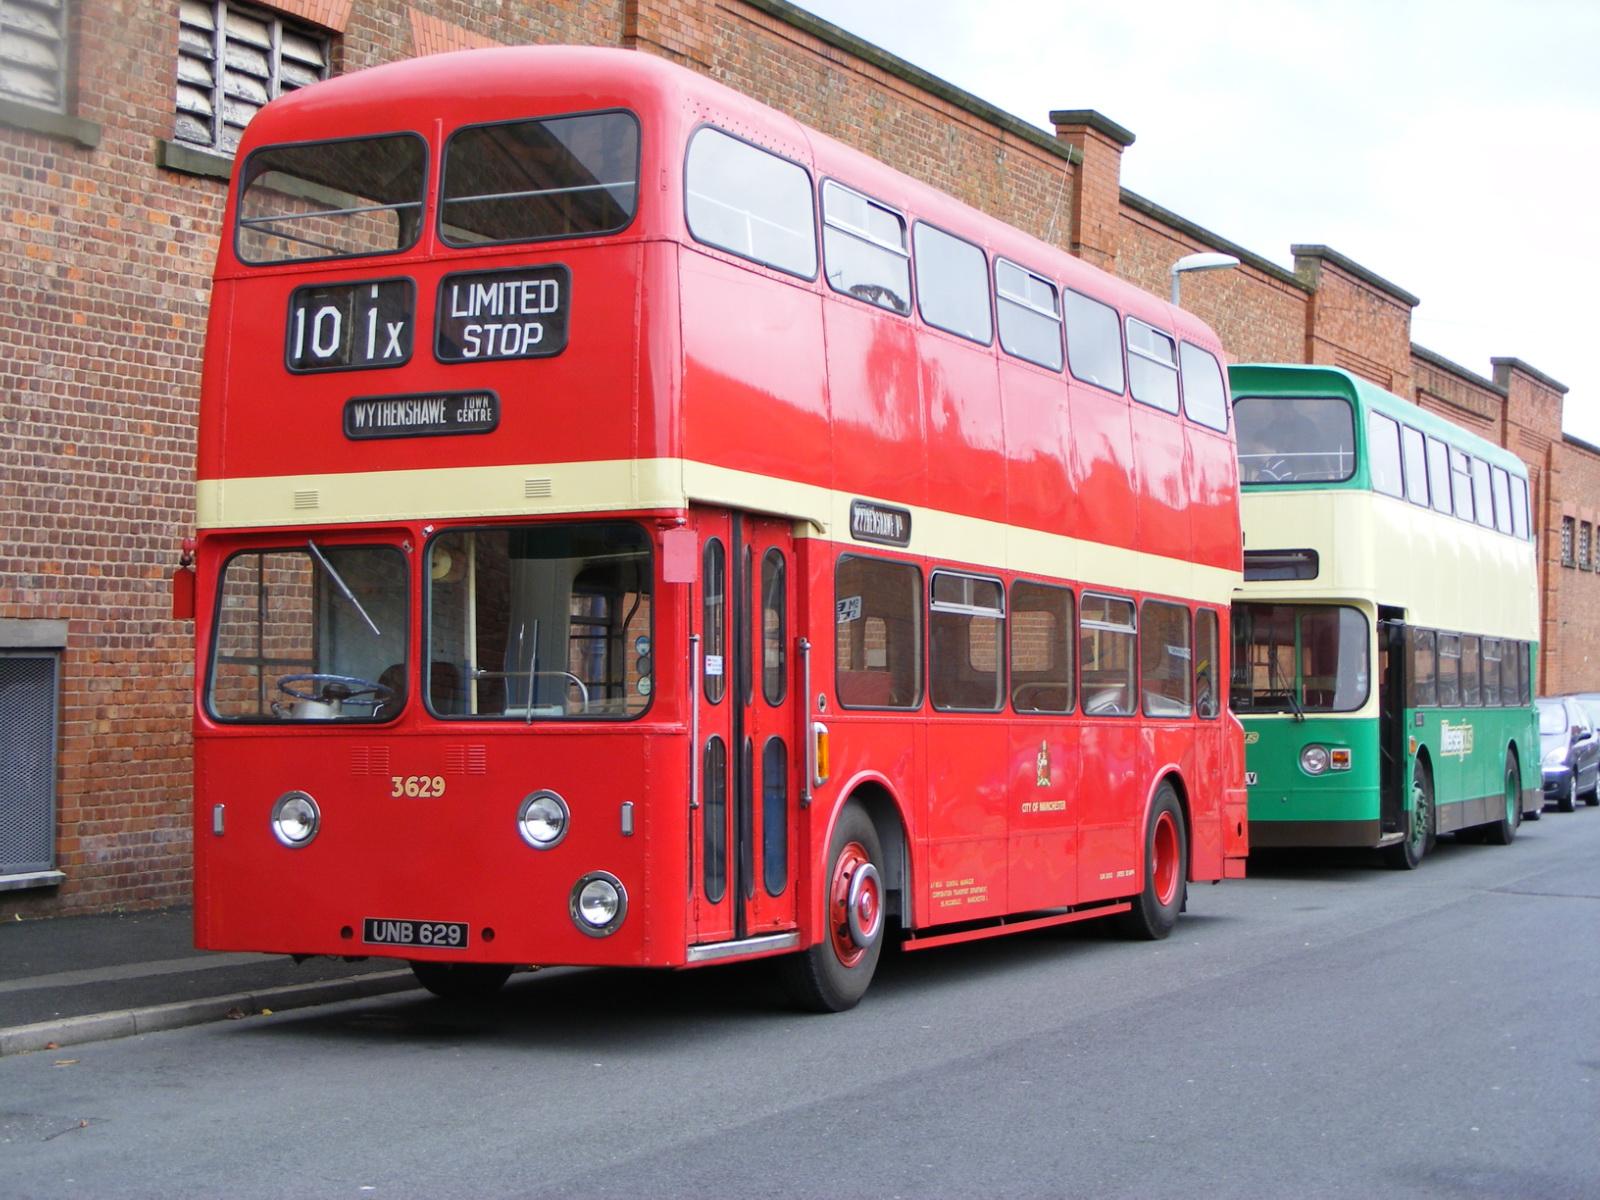 File:Manchester City Transport bus 3629 (UNB 629), MMT Atlantean 50  event.jpg - Wikimedia Commons